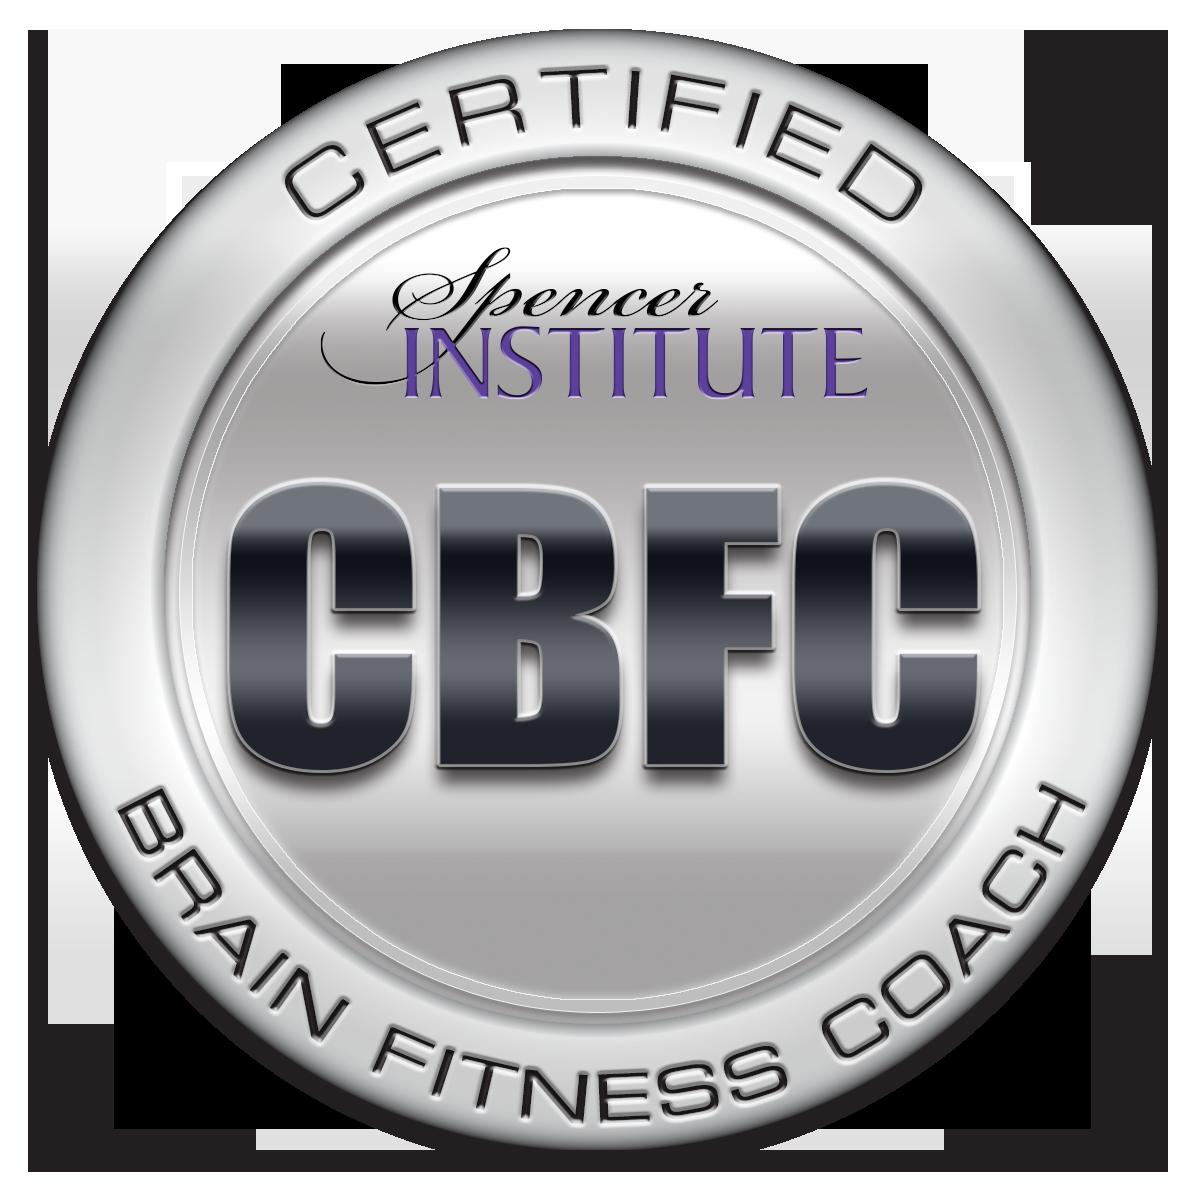 CBFC-SI-CertifiedBrainFitness-1200.png